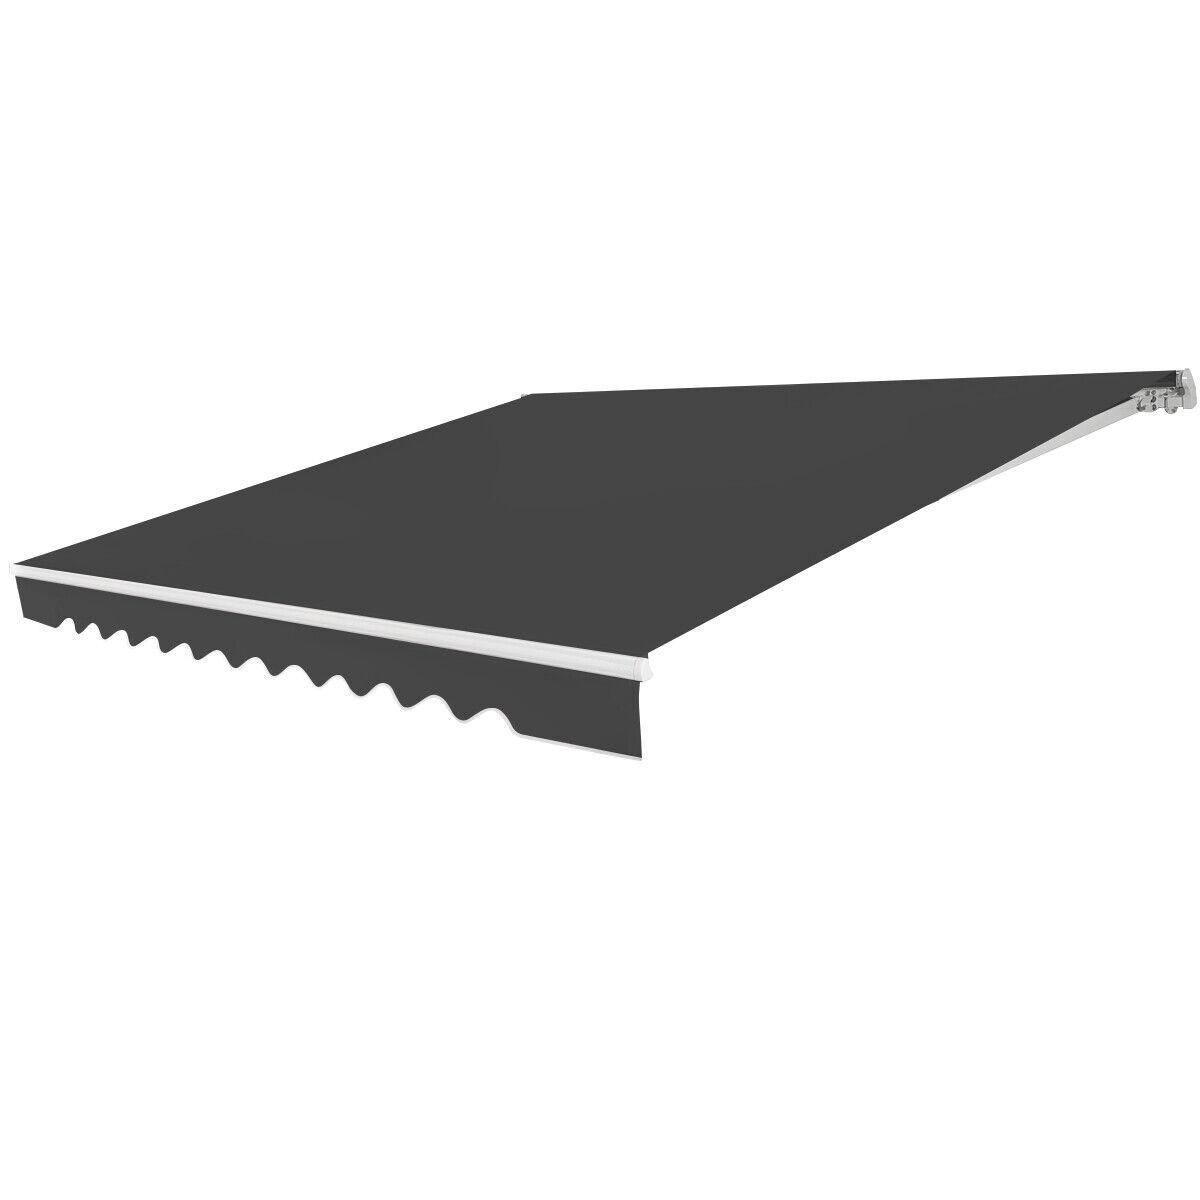 Markise mit kurbel Balkonmarkise Gelenkarmmarkise Sonnenmarkise 300x250cm